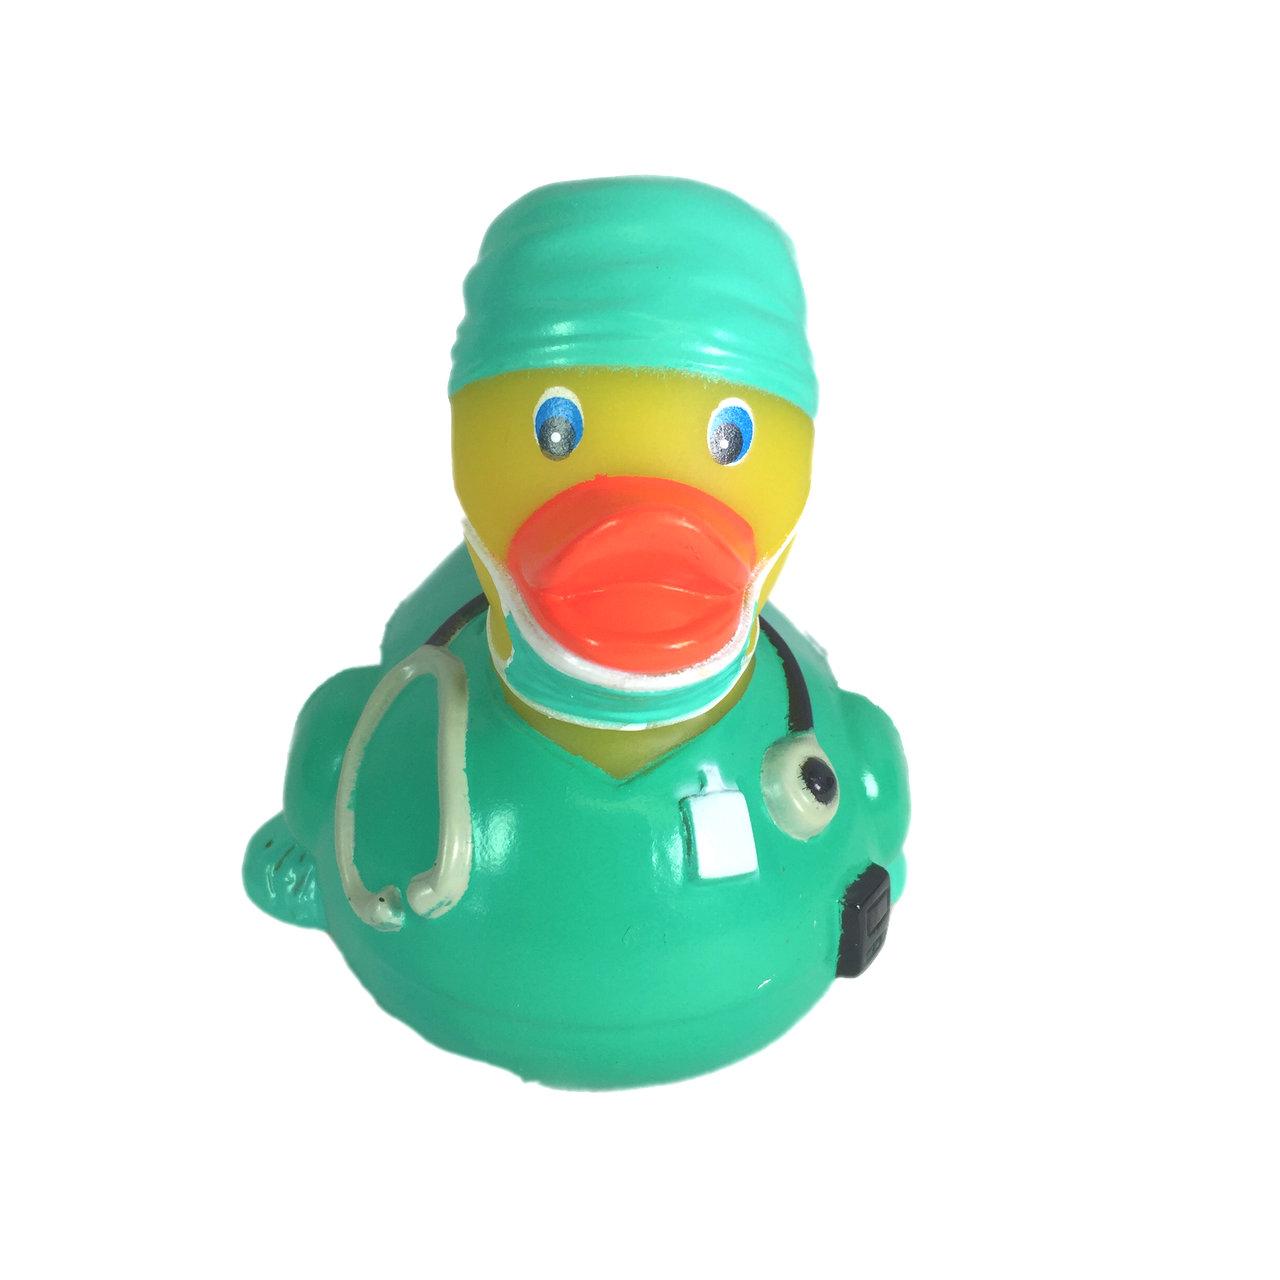 1280x1280 Doctor Surgeon Rubber Duck Ducks In The Window